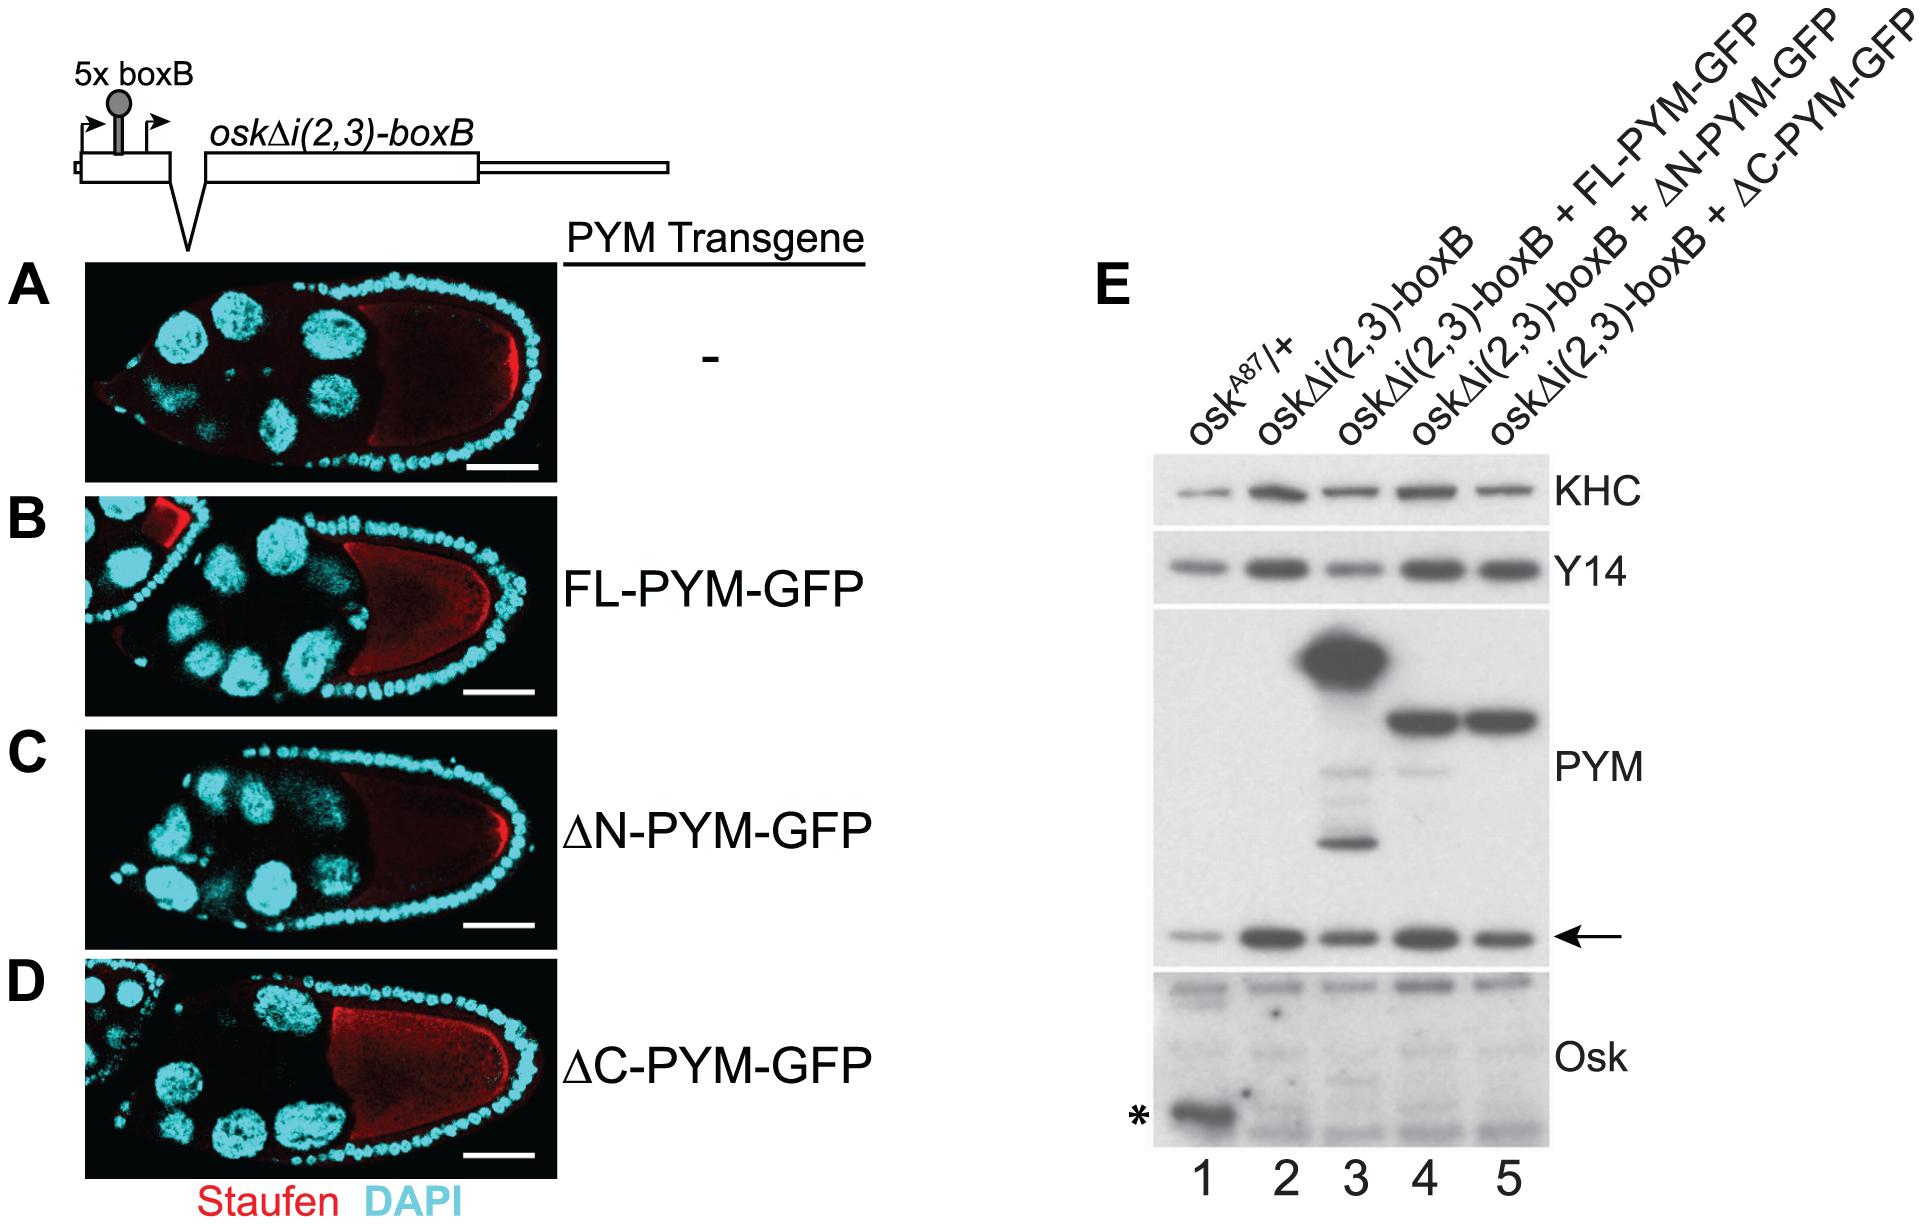 PYM disassembles EJC from a non-translatable <i>oskar</i> mRNA.